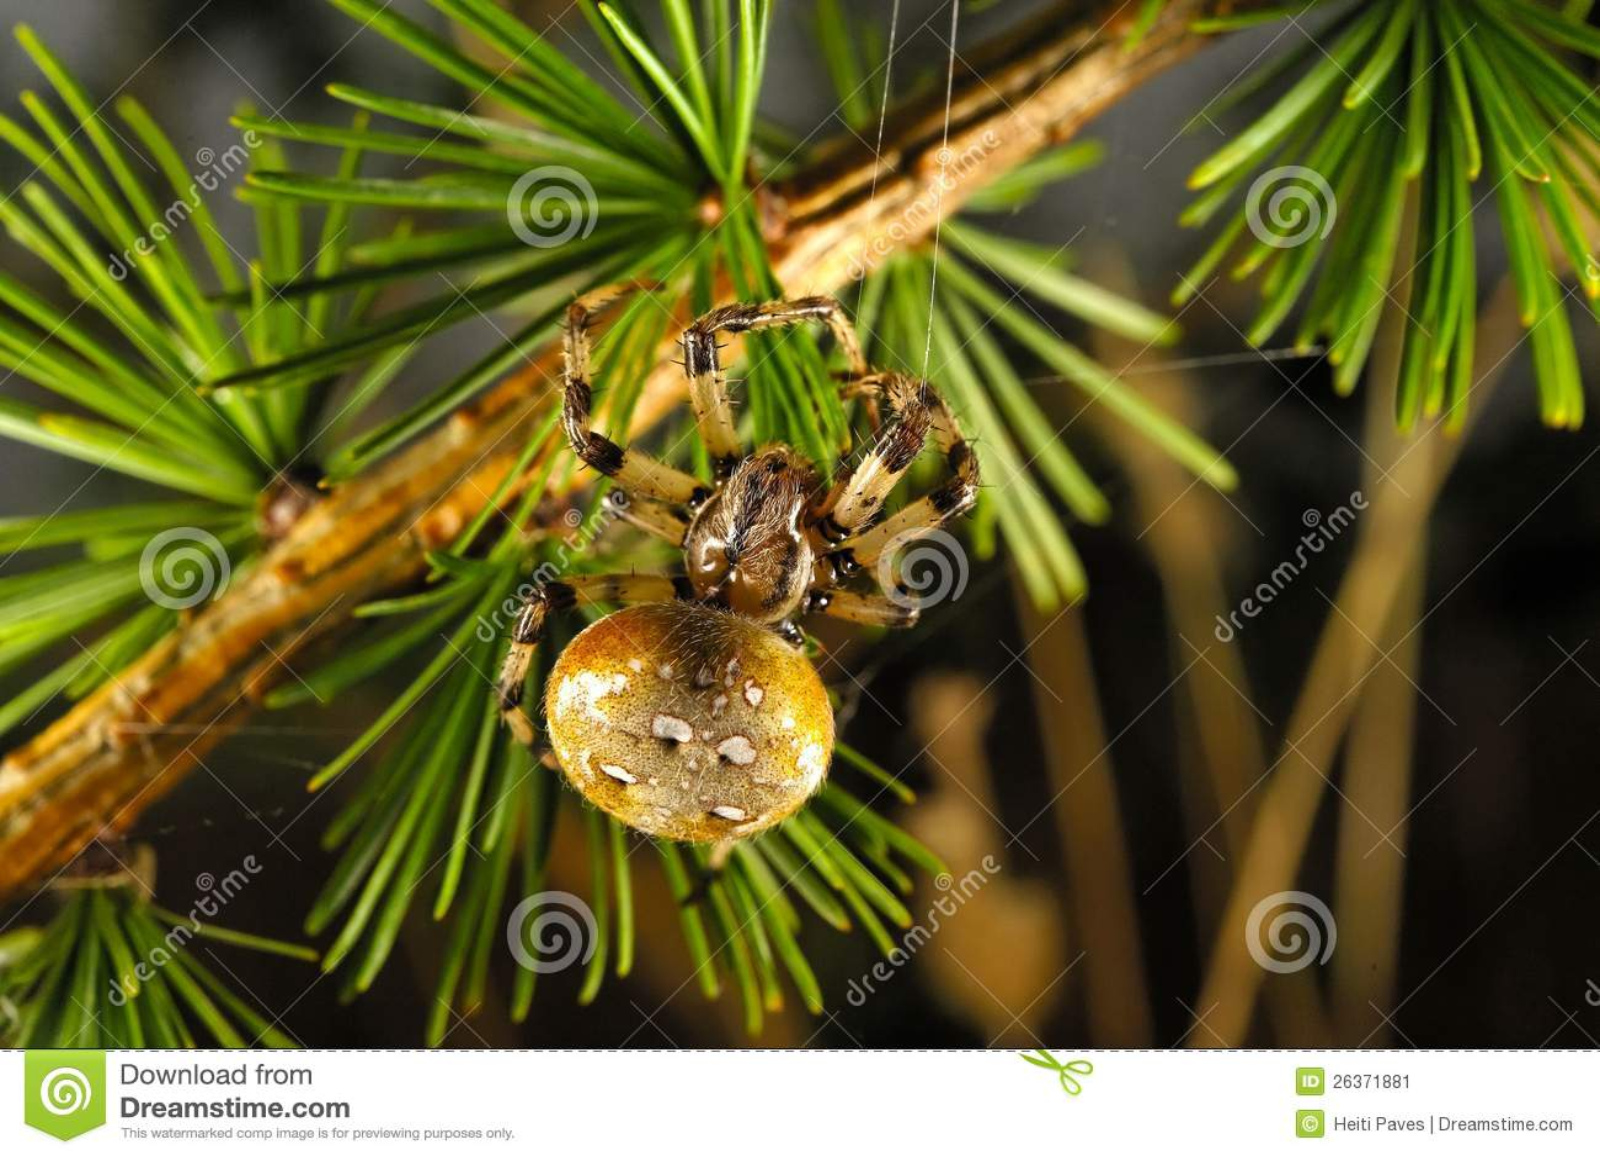 Europäische Gartenspinne